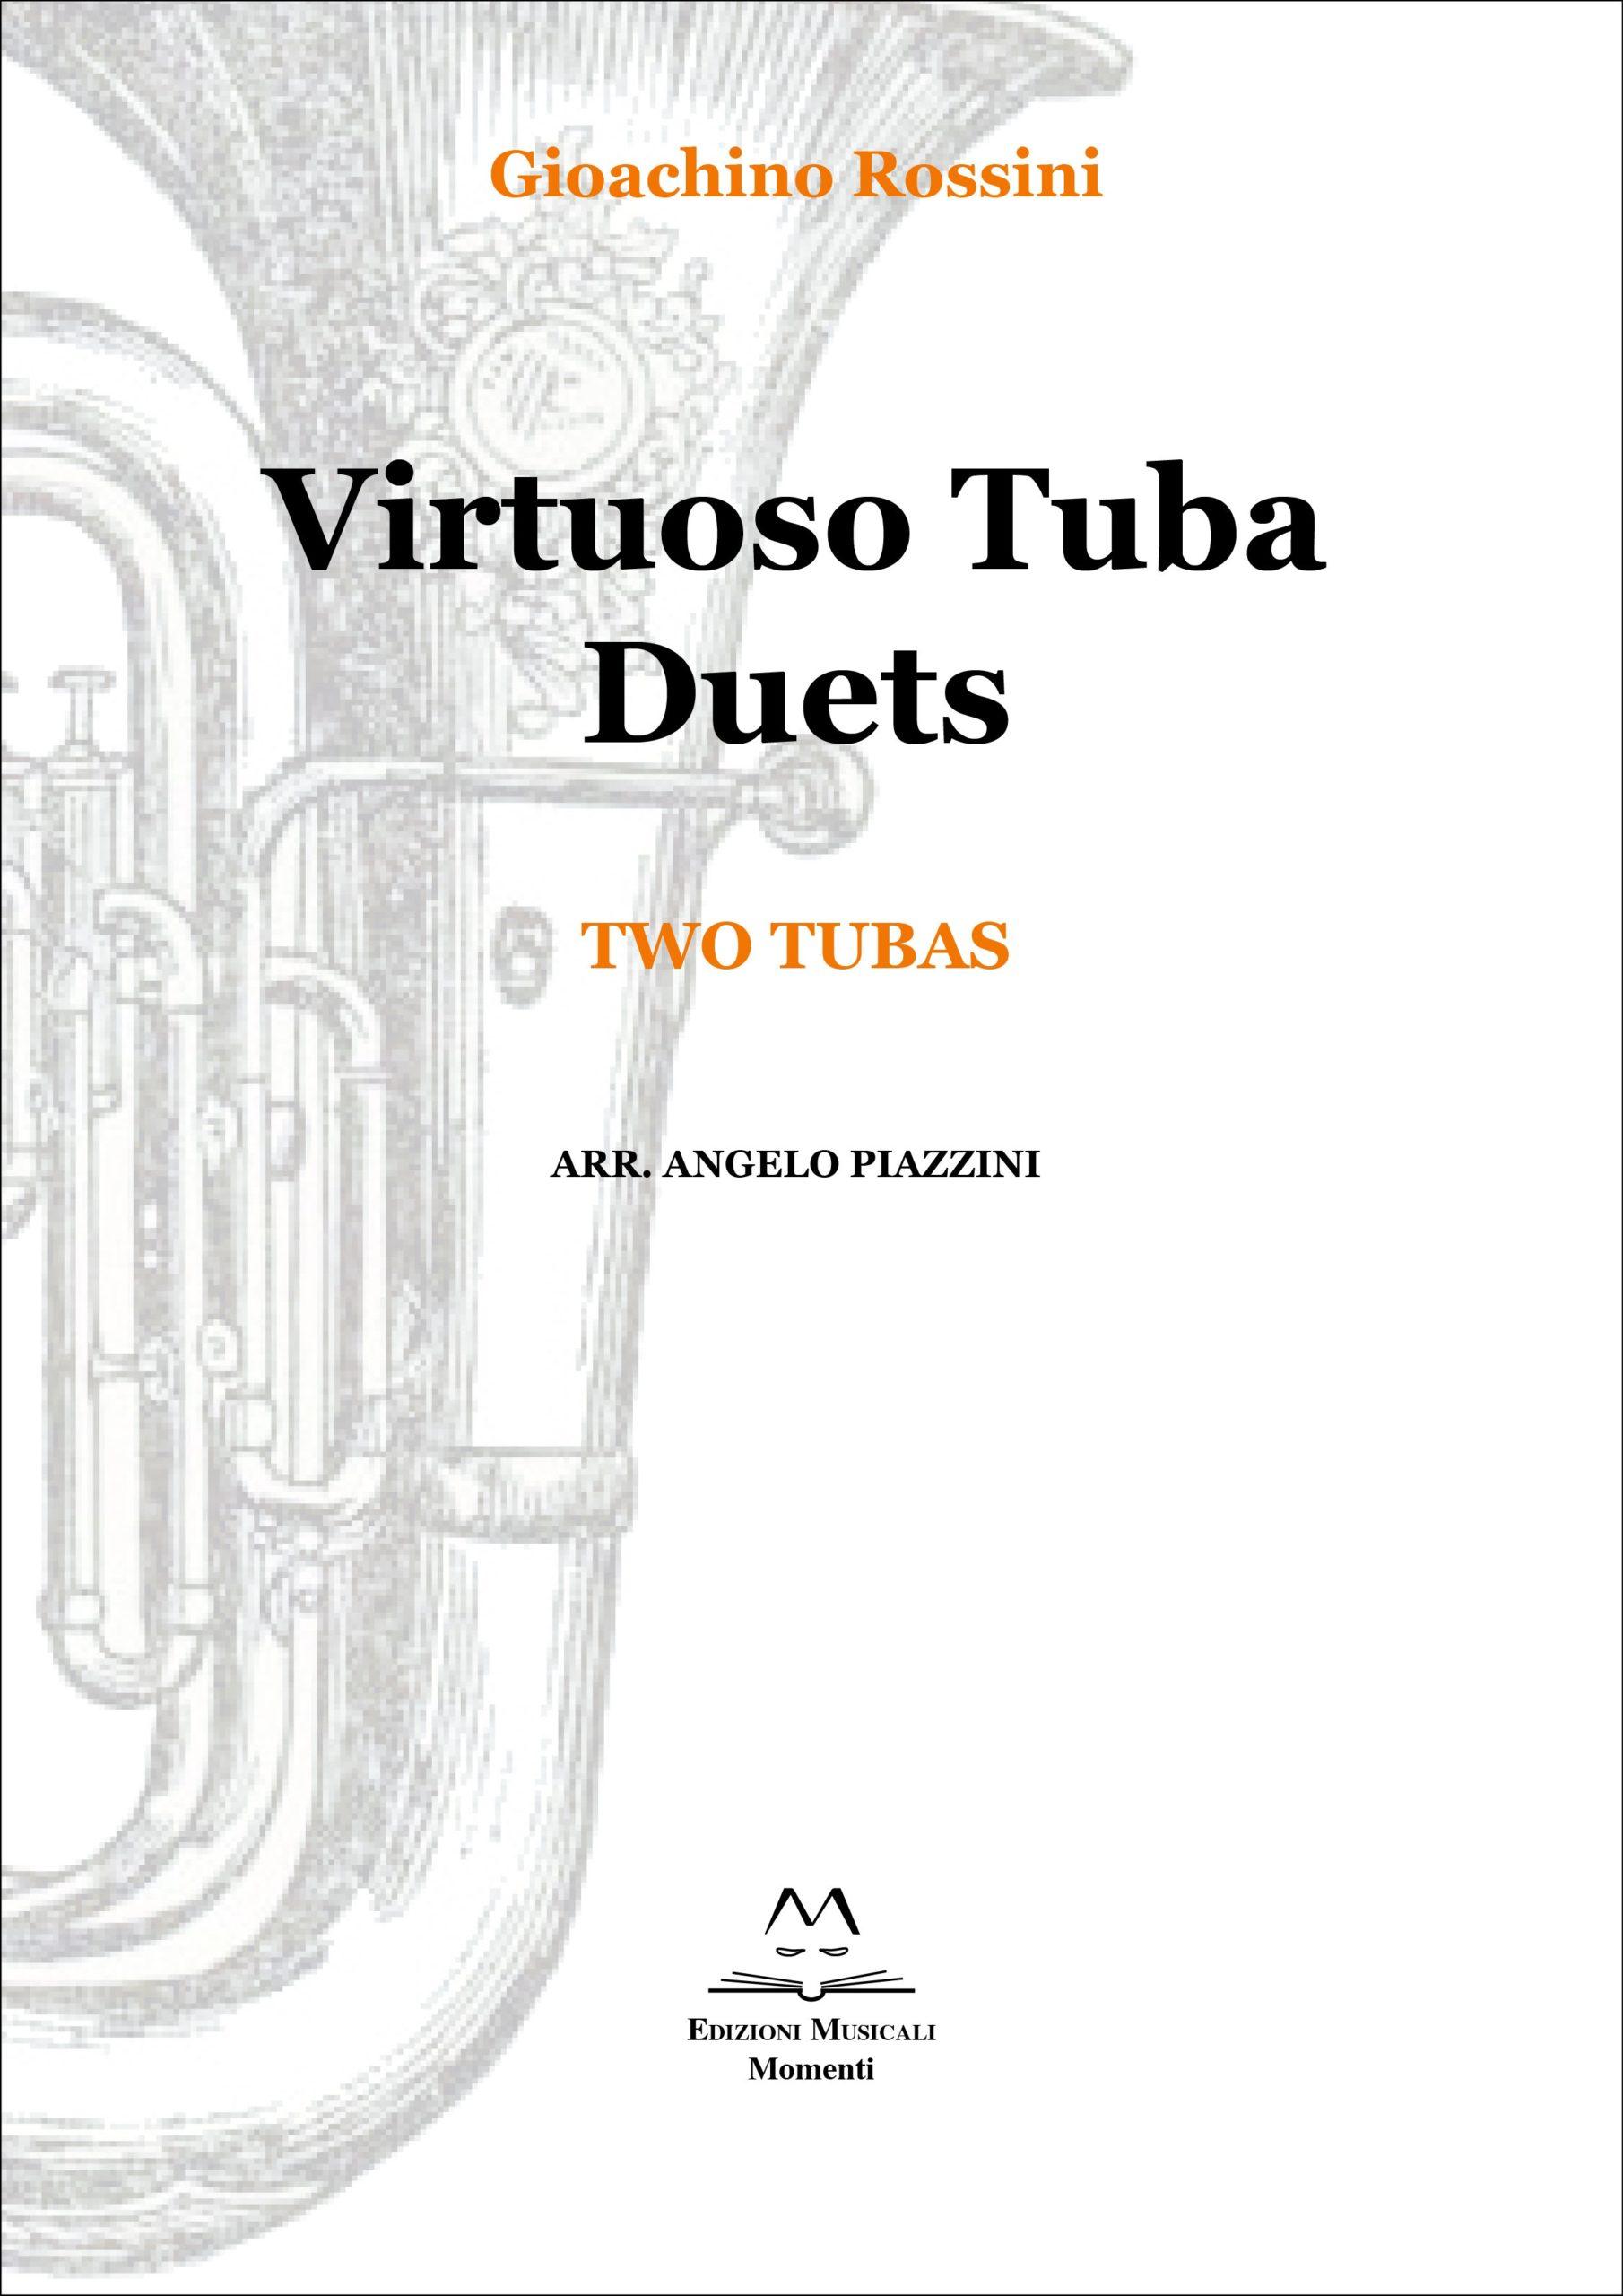 Virtuoso Tuba Duets - Two tubas arr. Angelo Piazzini